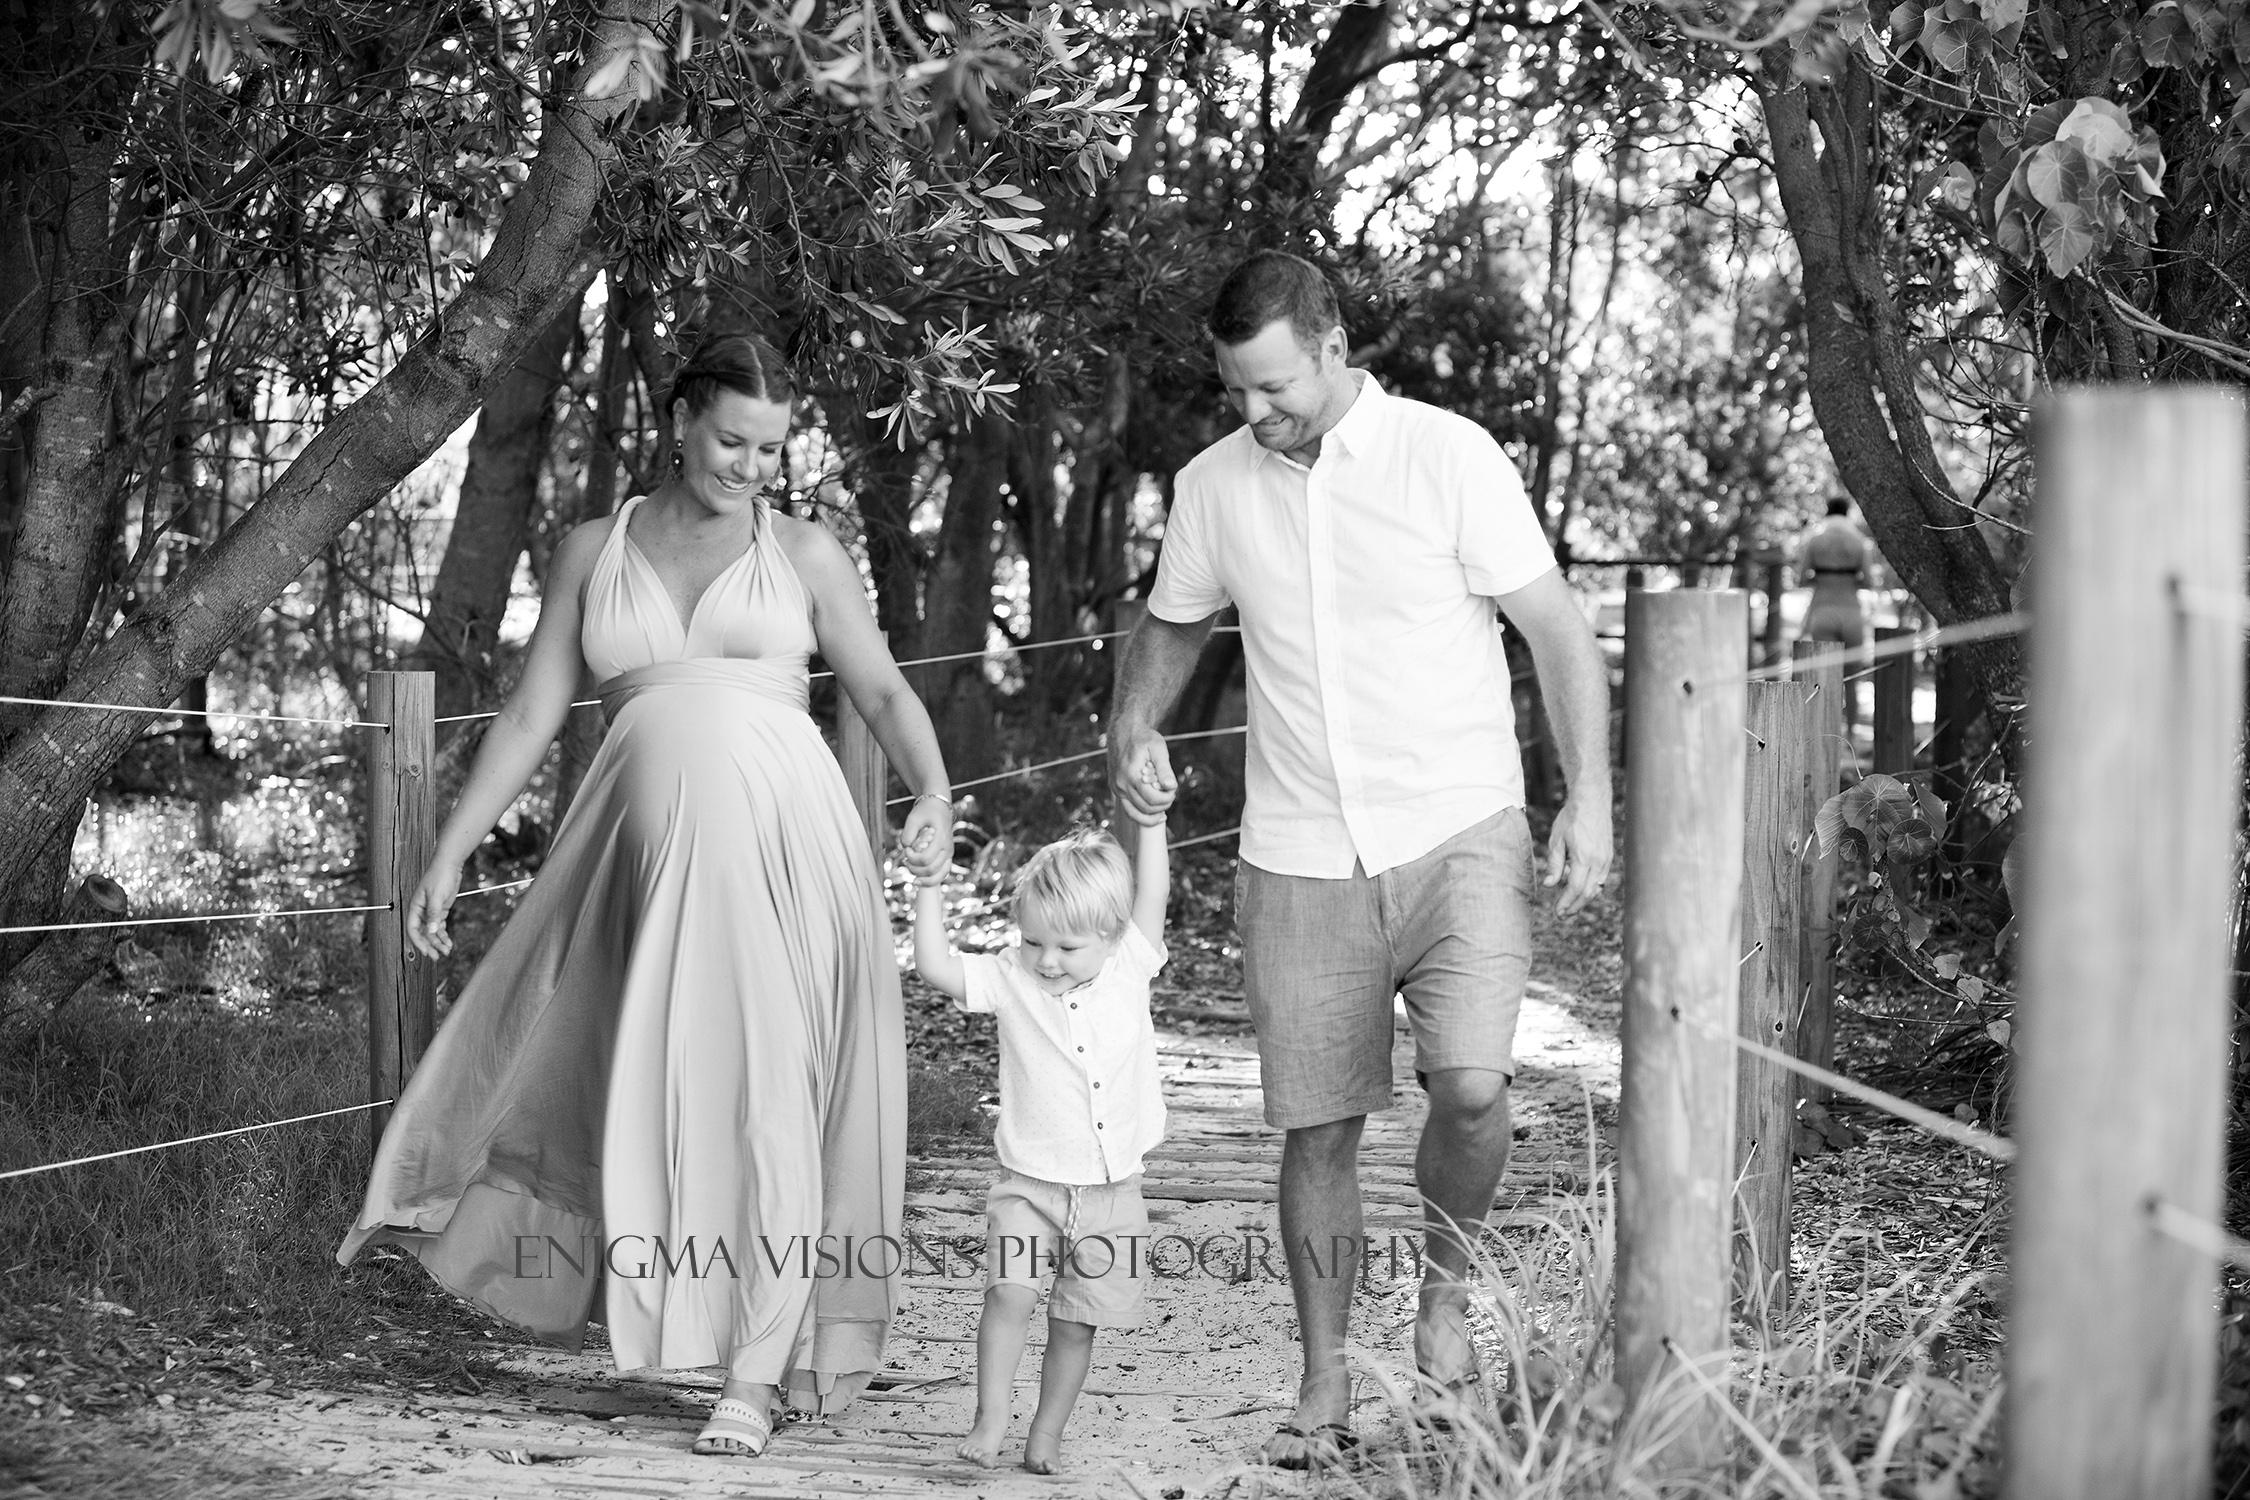 enigma_visions_photography_maternity_tara (21).jpg